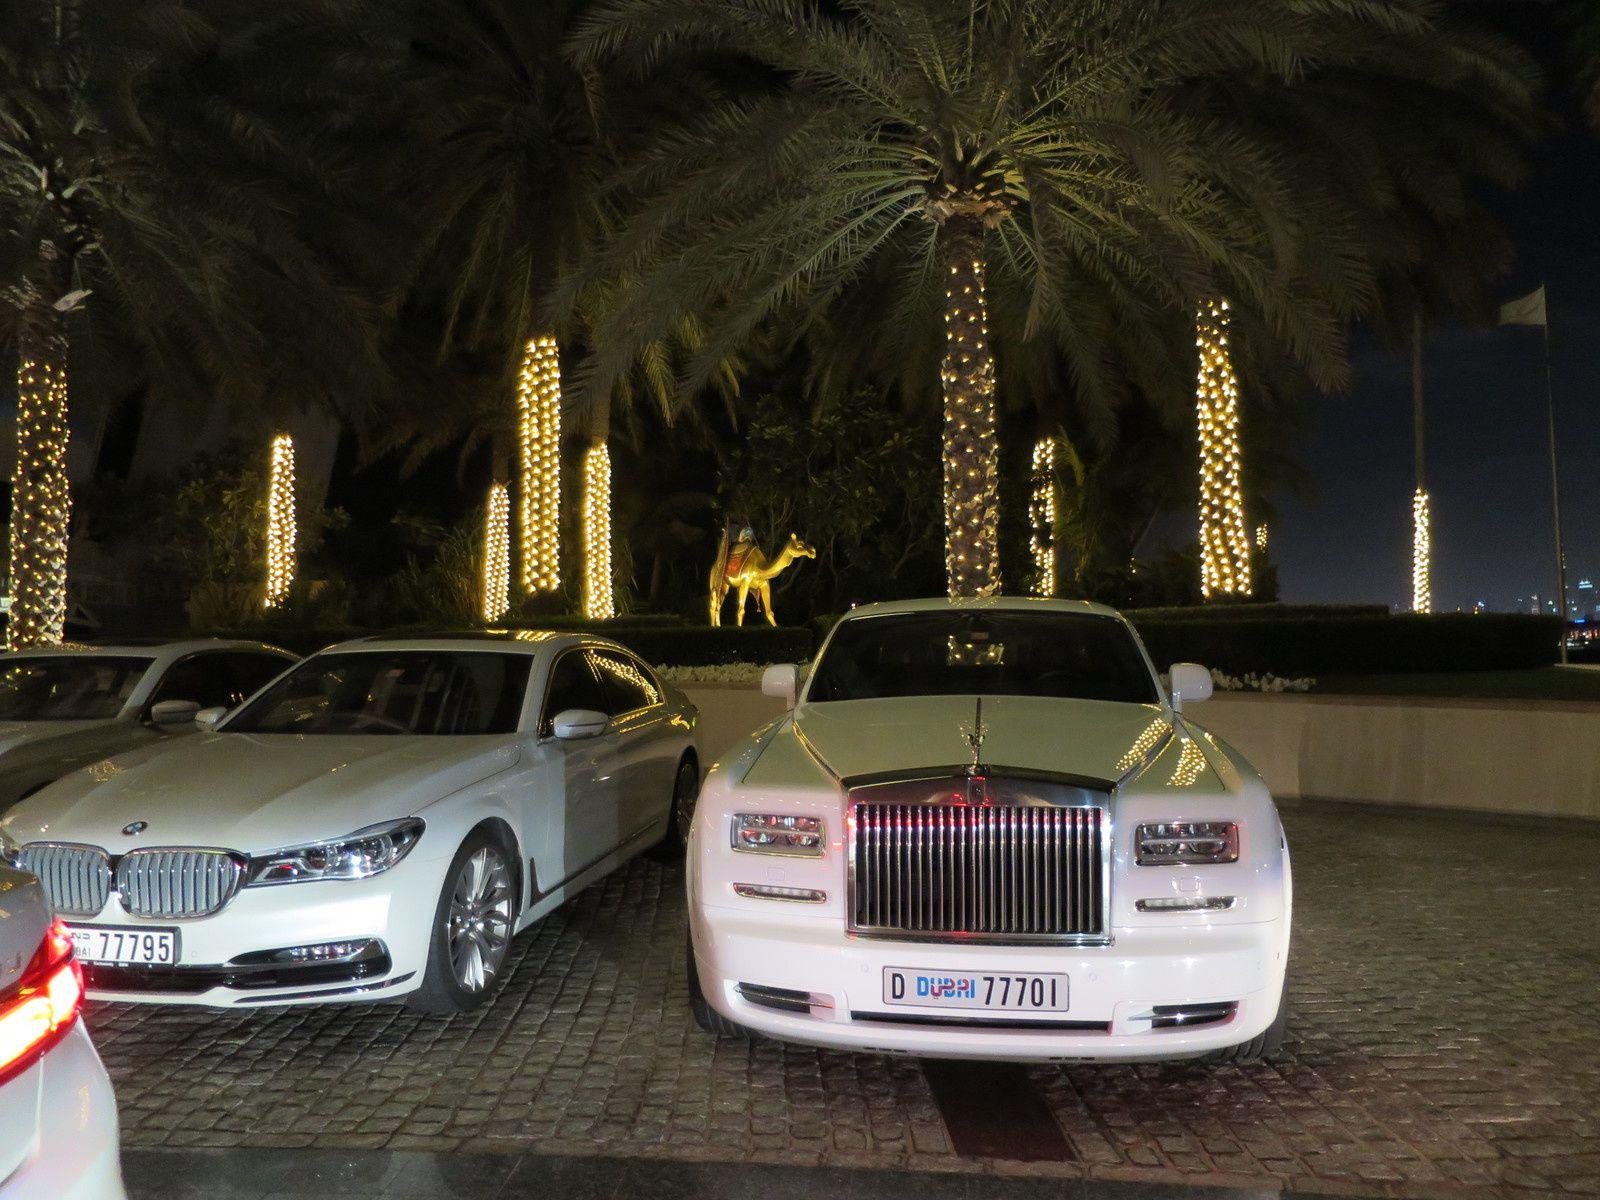 Rolls Royce. Ph. Delahaye. A l'arrière plan, l'hôtel Jumeirah. Ph. Delahaye.